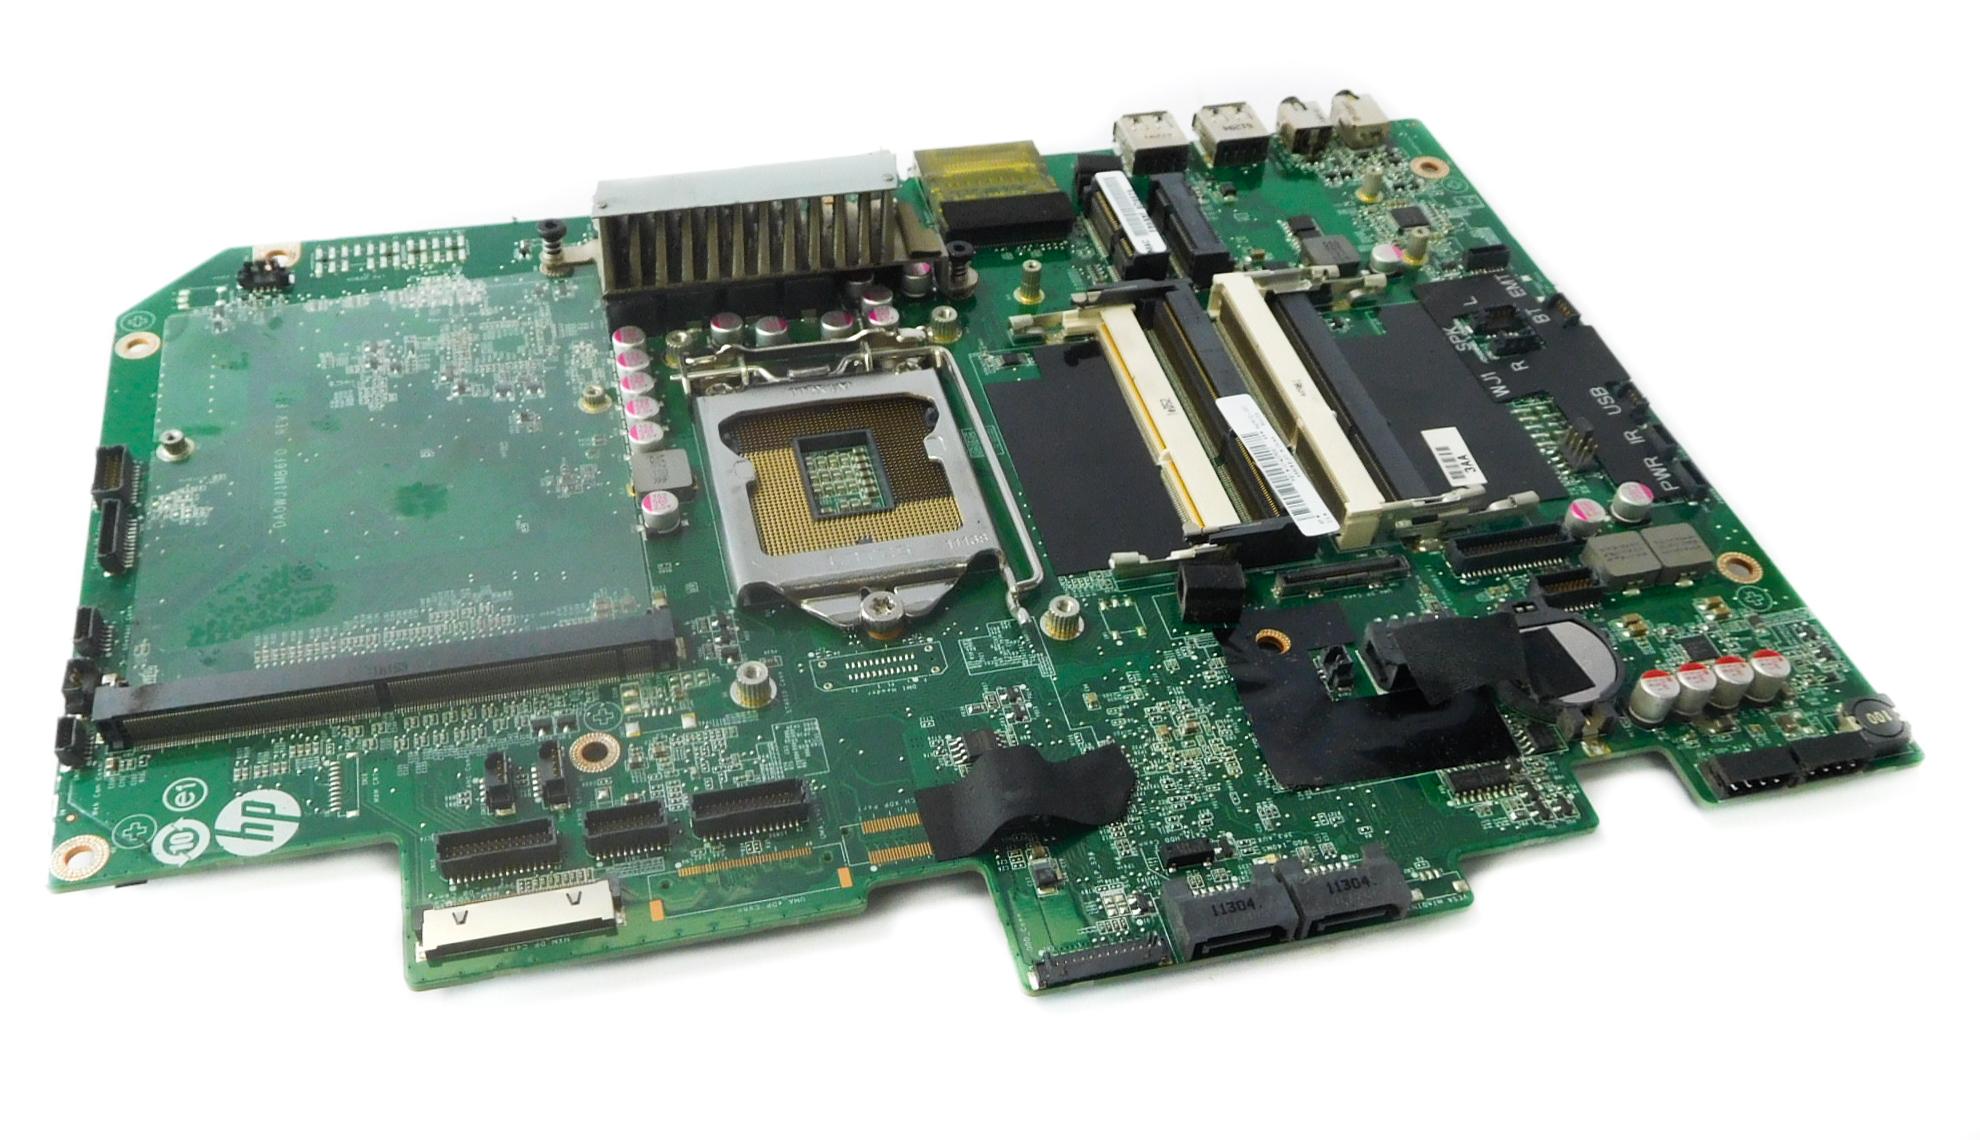 647610-001 HP Touchsmart 600 System Motherboard DA0WJ1MB6F0 REV:F